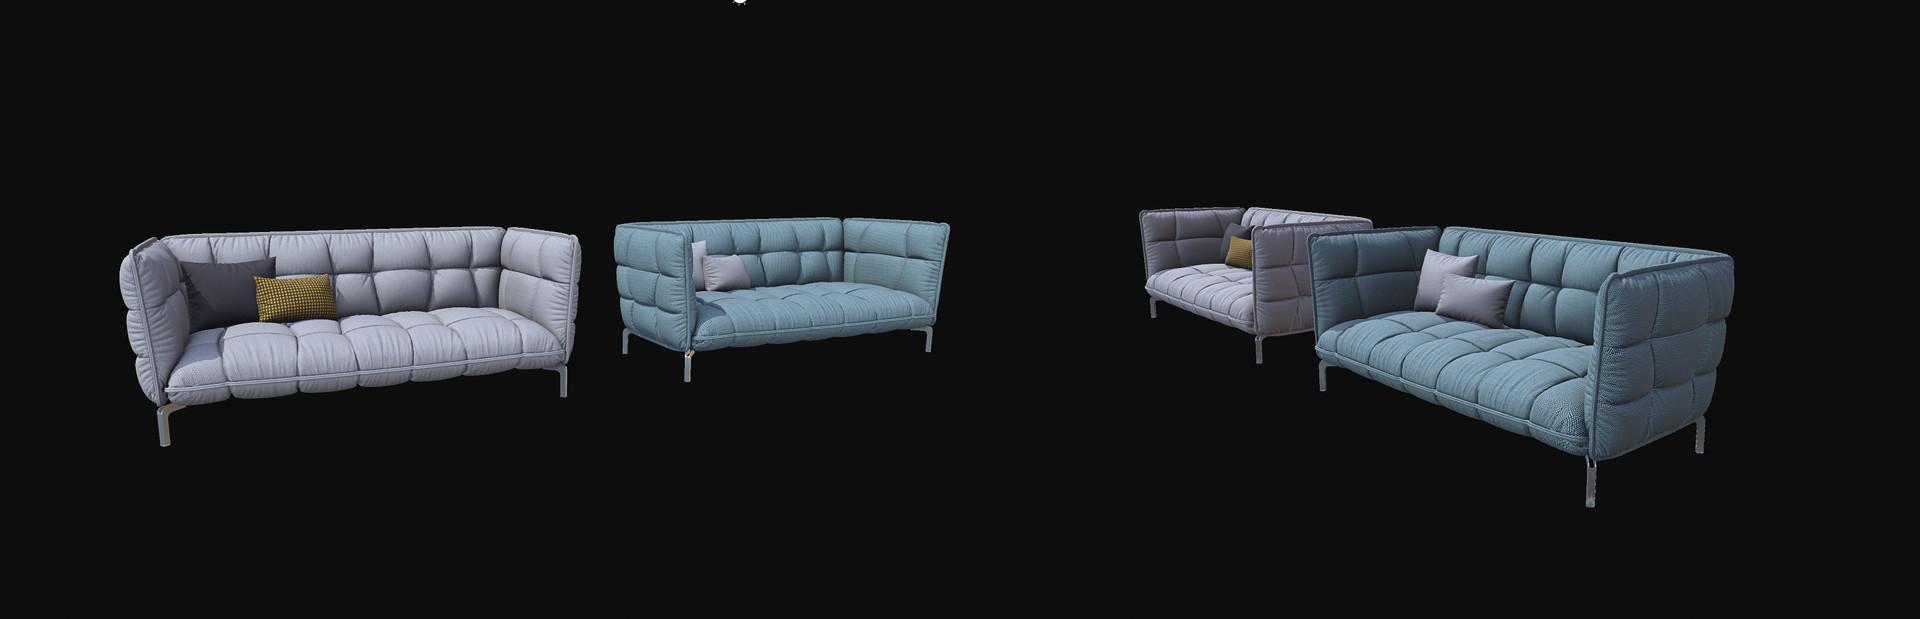 HUSK sofa B&B Italia 225 [low]